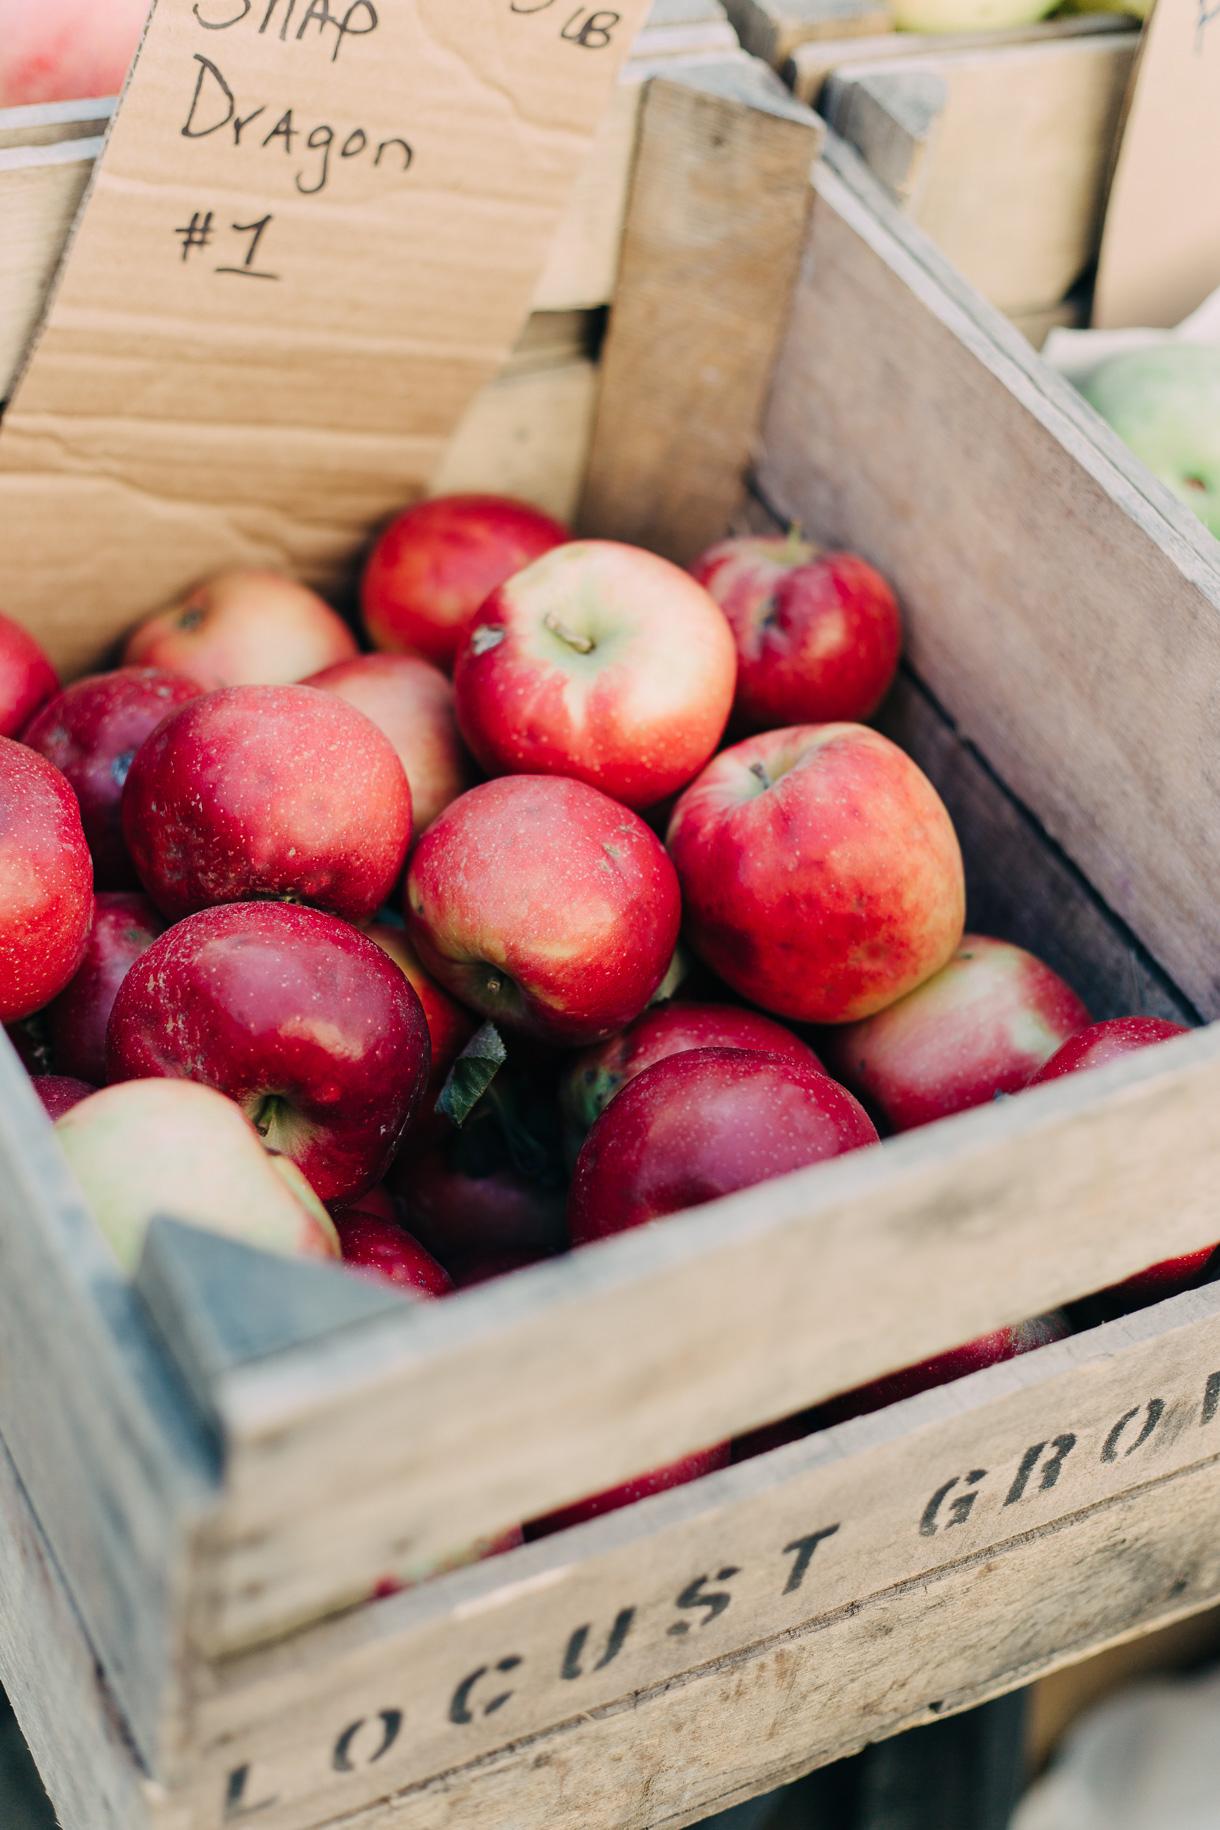 fall-at-union-square-farmers-market-3056